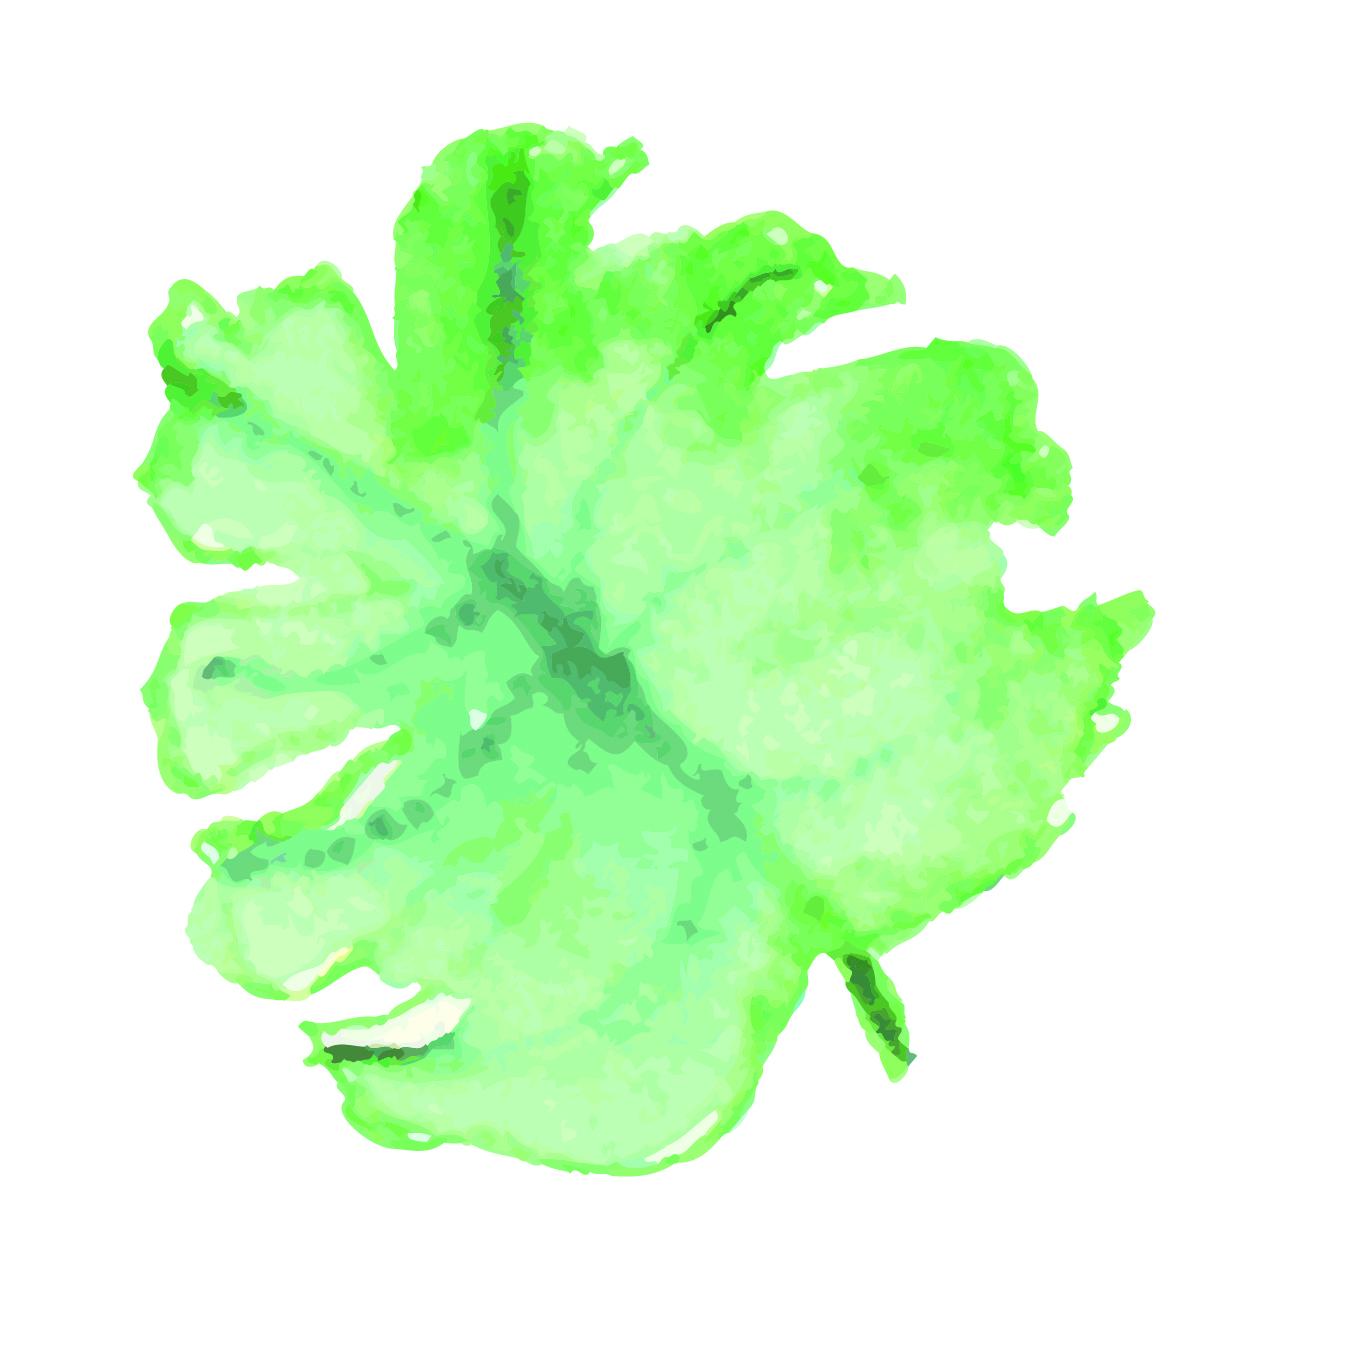 Tropicla Breeze clip art bundle example image 7